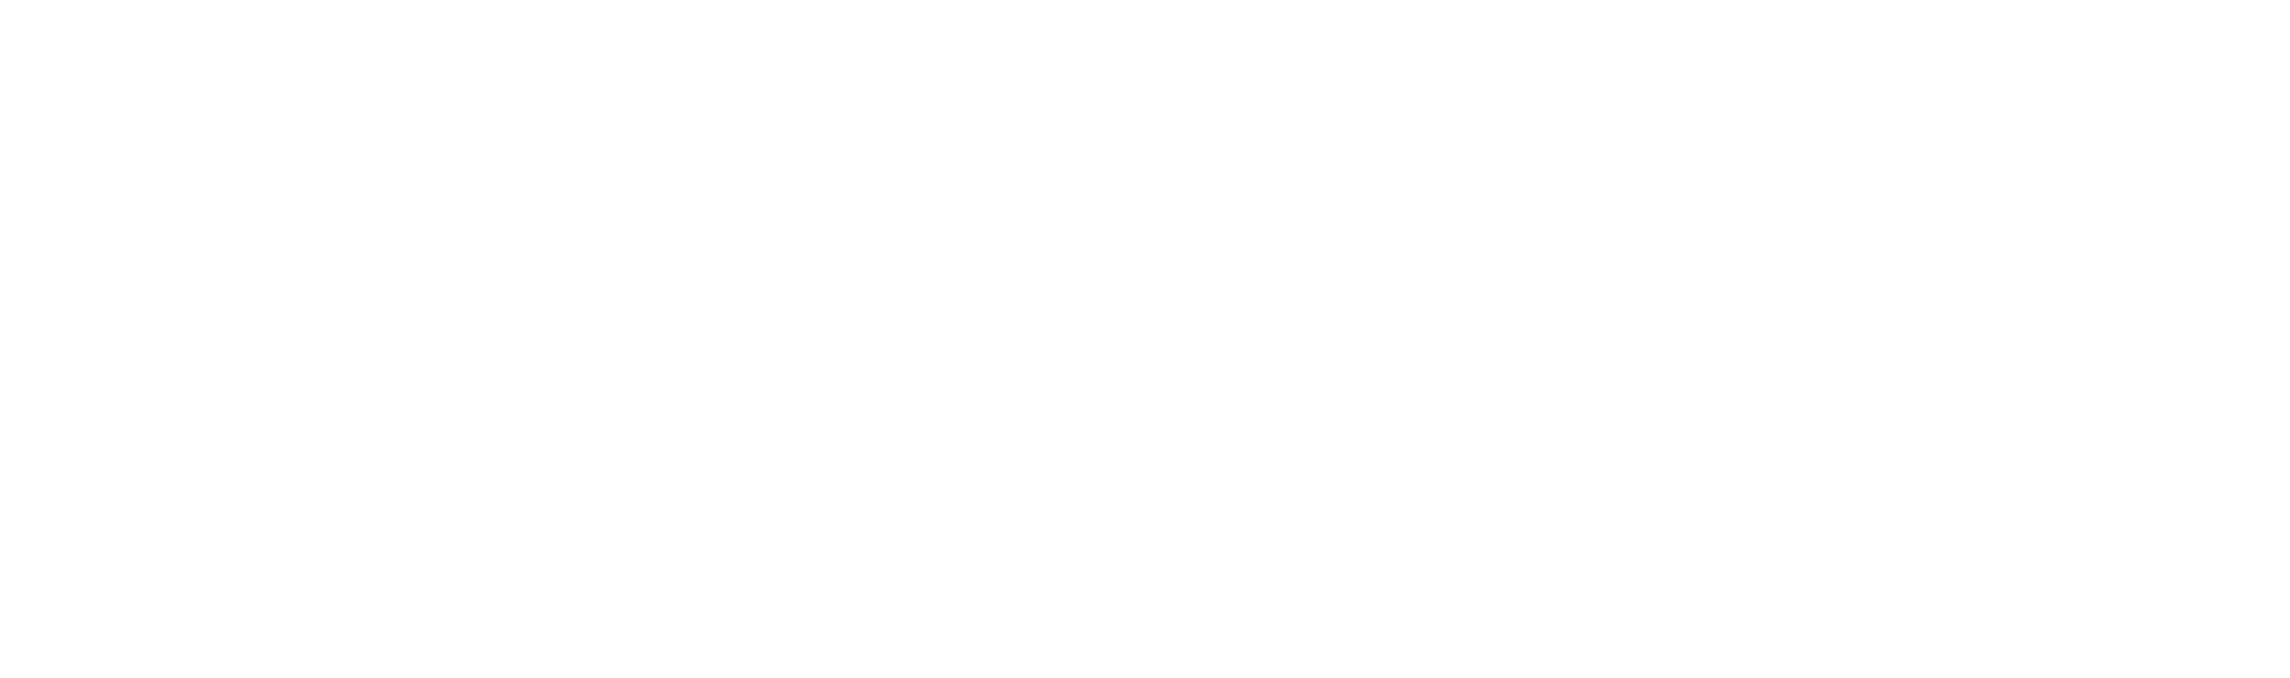 RM Logistic - Servicios logísticos integrales | Servicios de transporte nacional e internacional